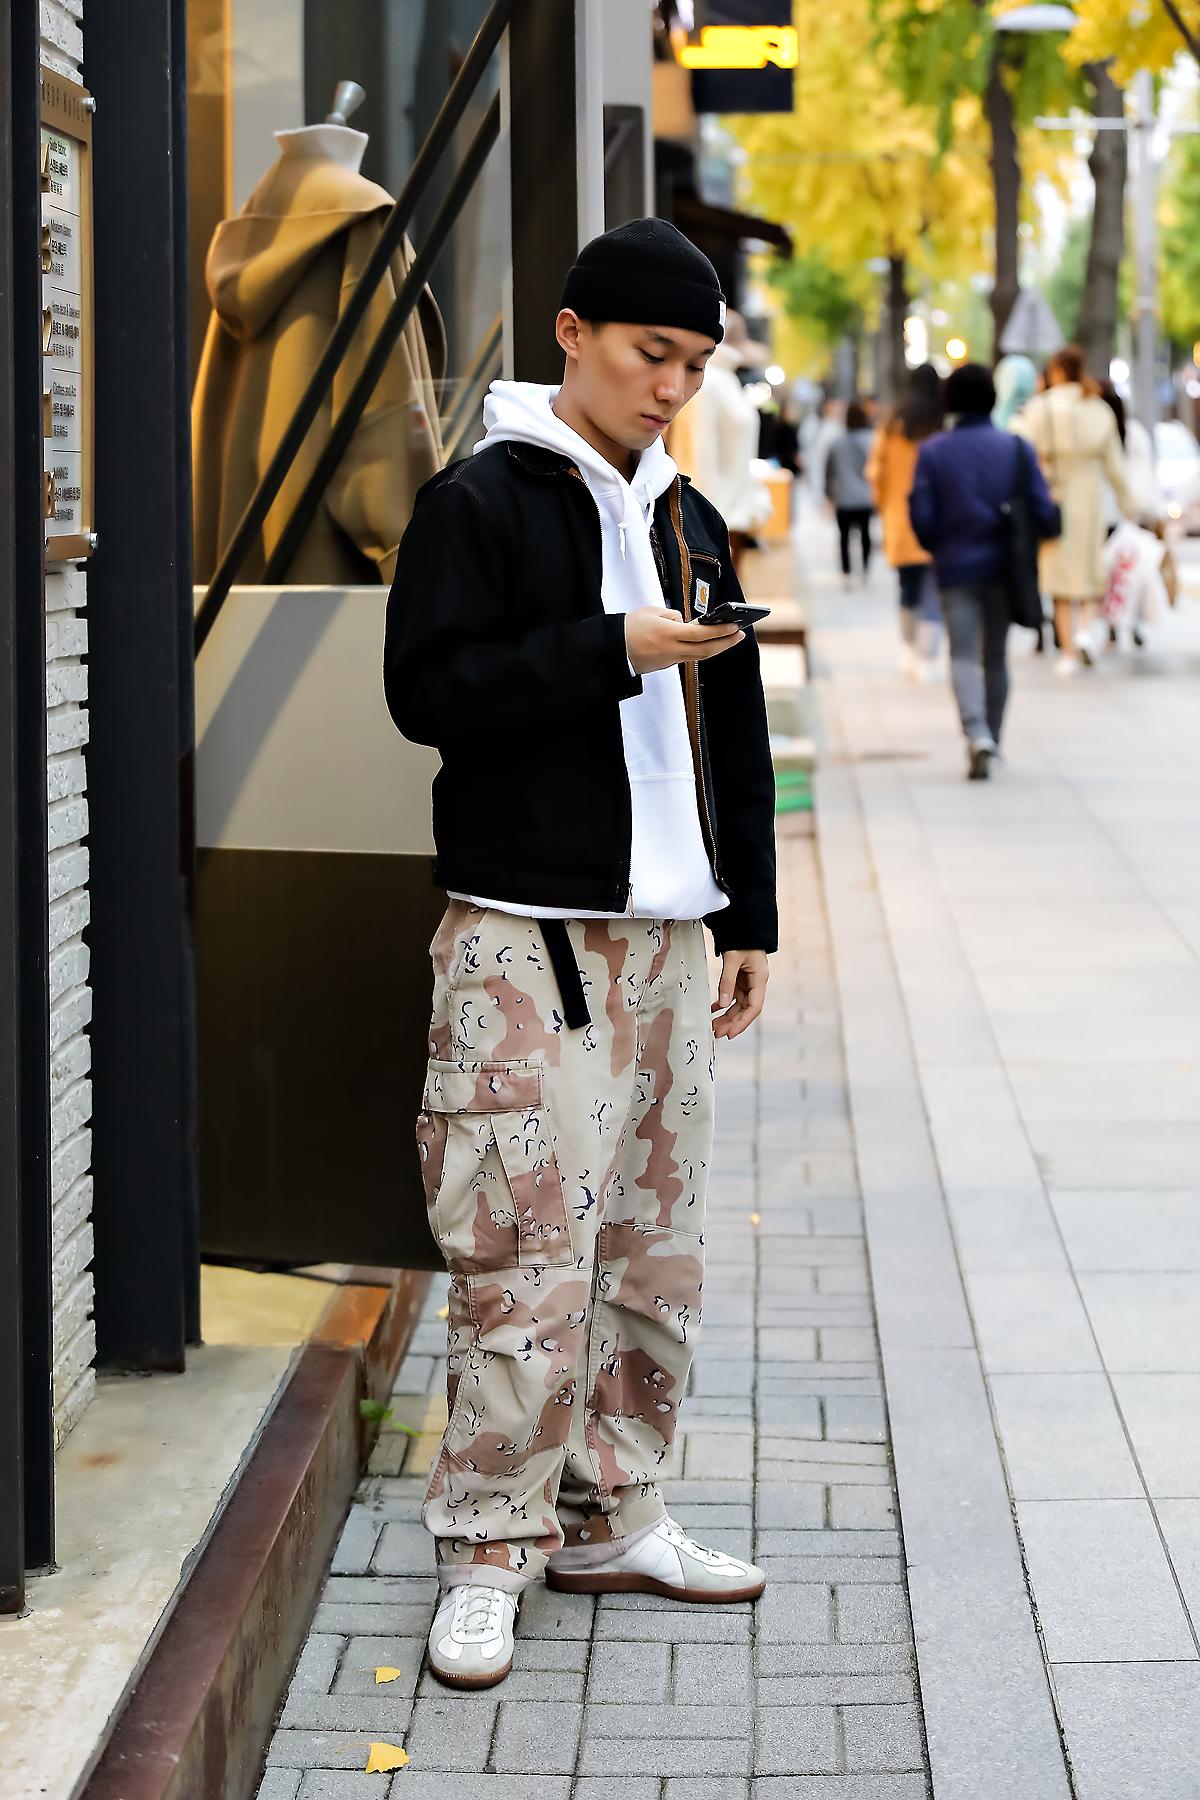 Men fall street style last week of october 2018 inseoul3